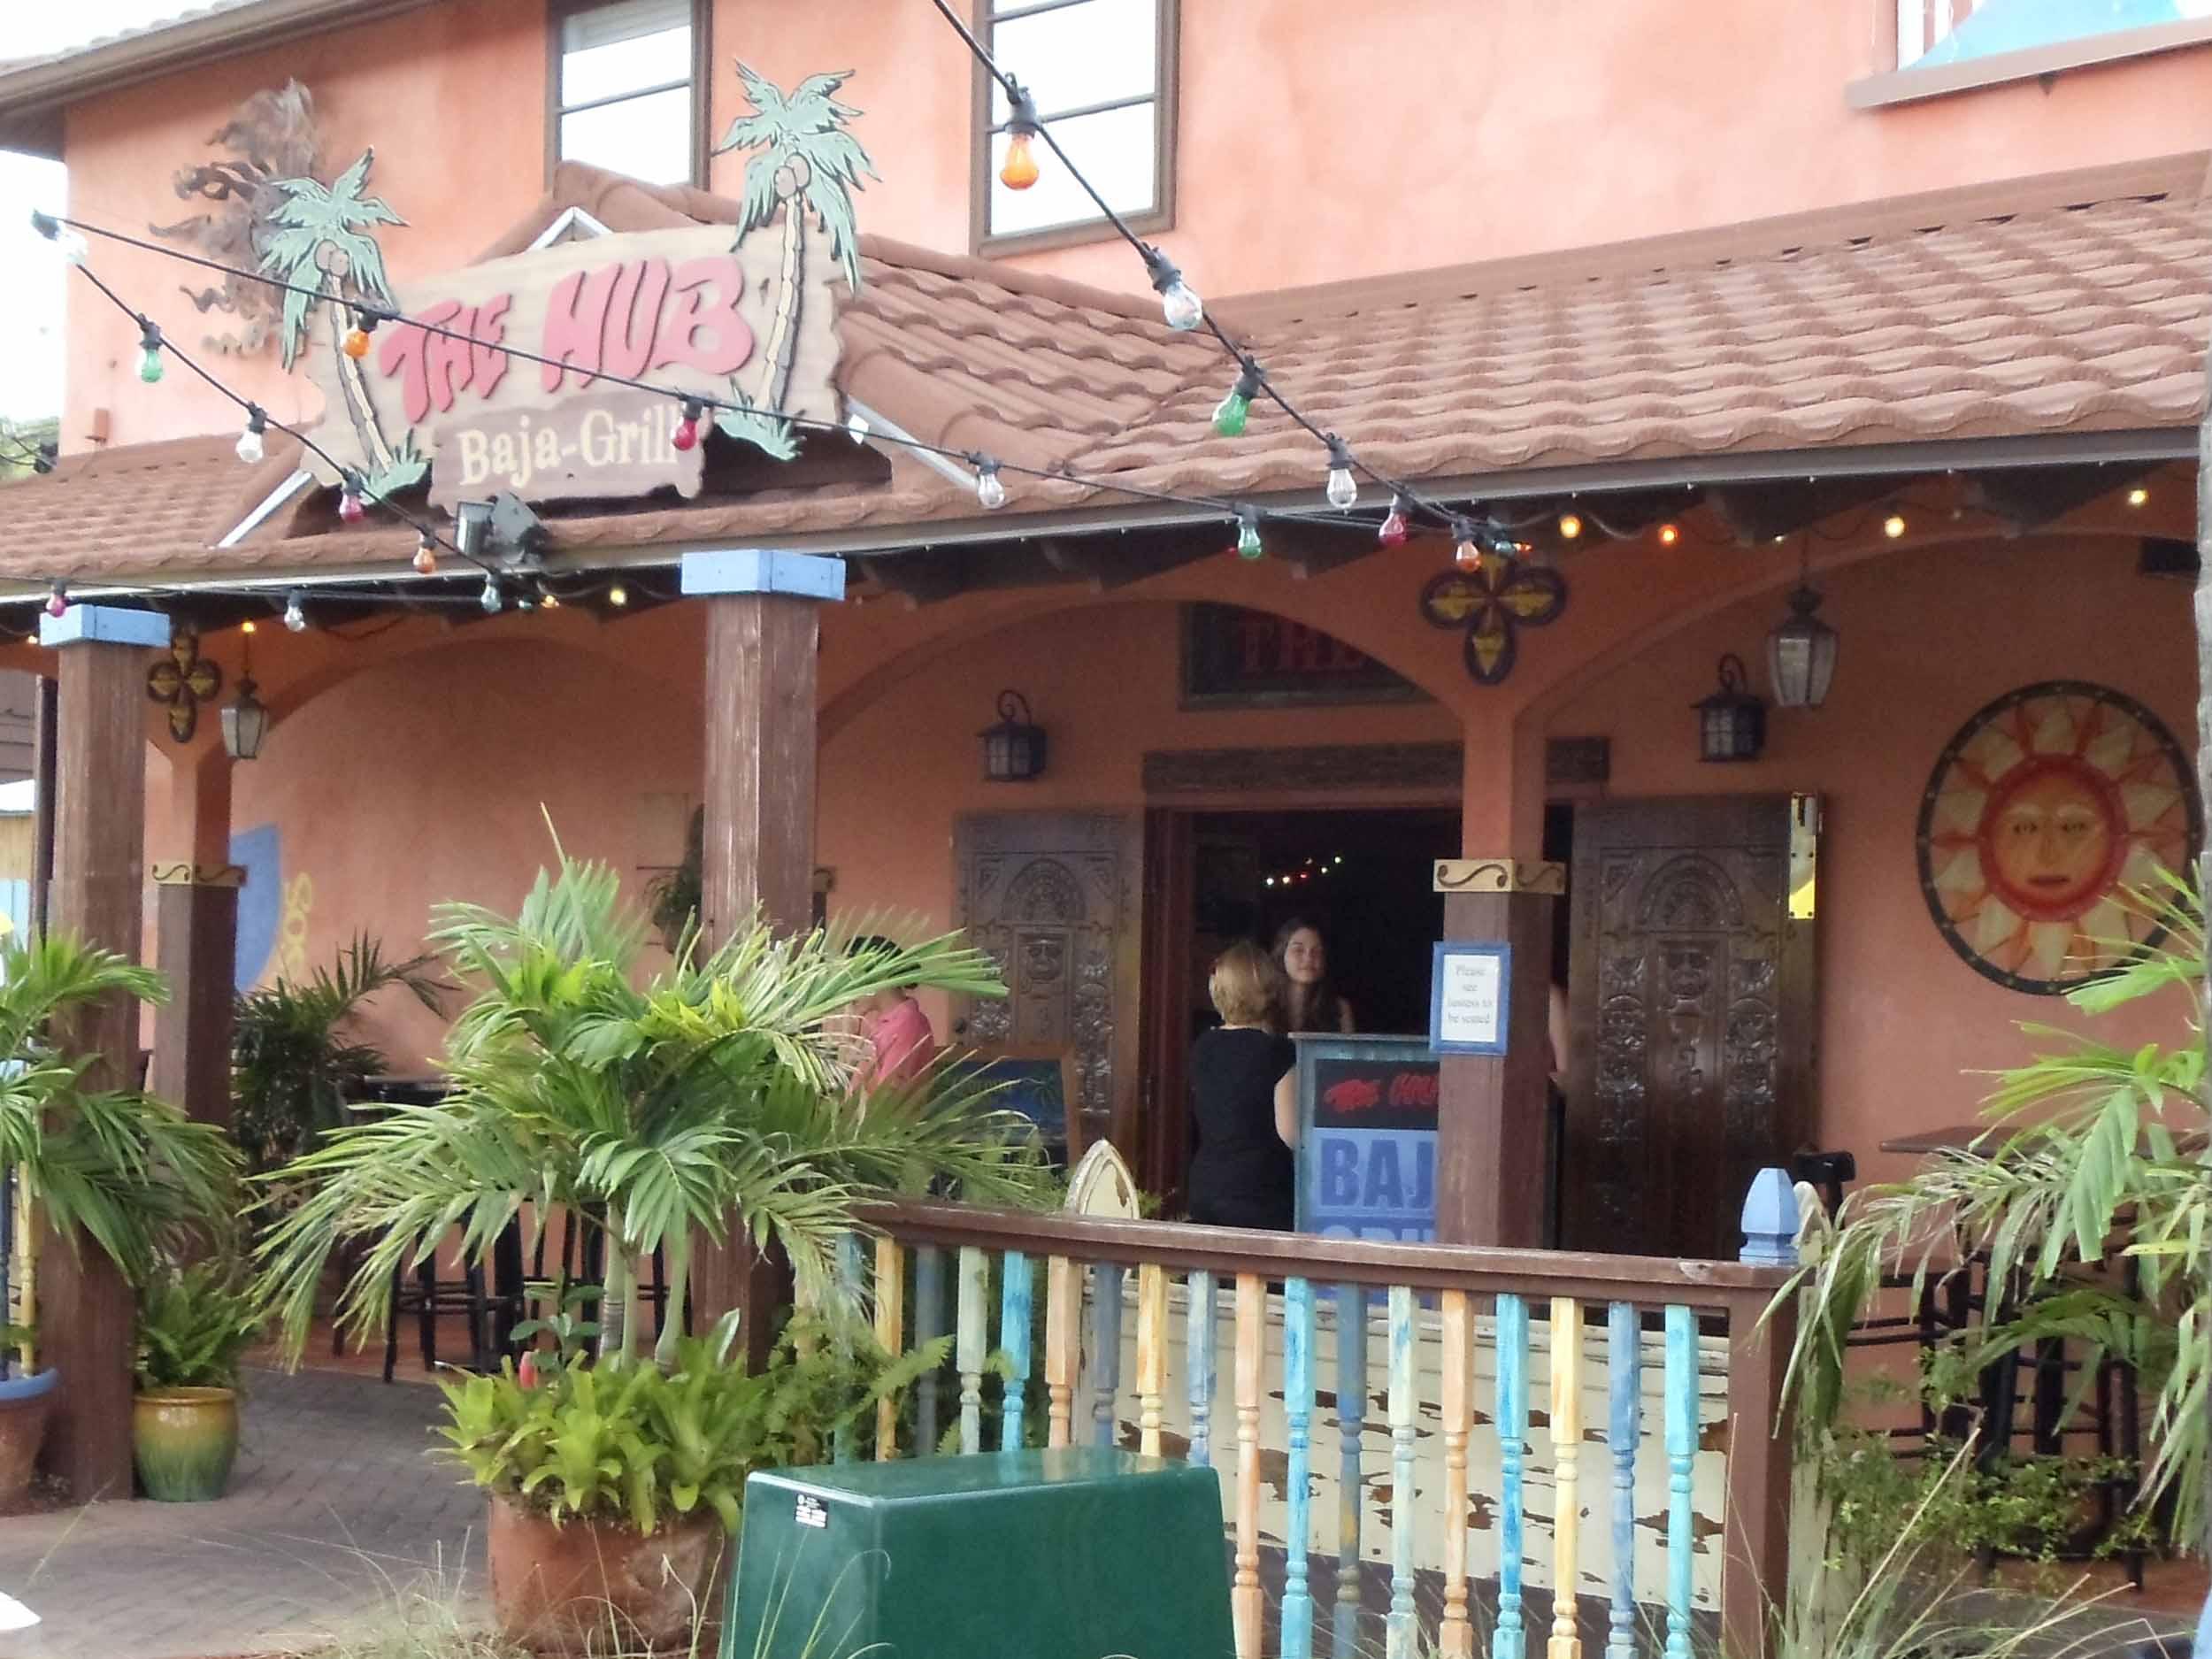 The Hub Baja Grill Entrance